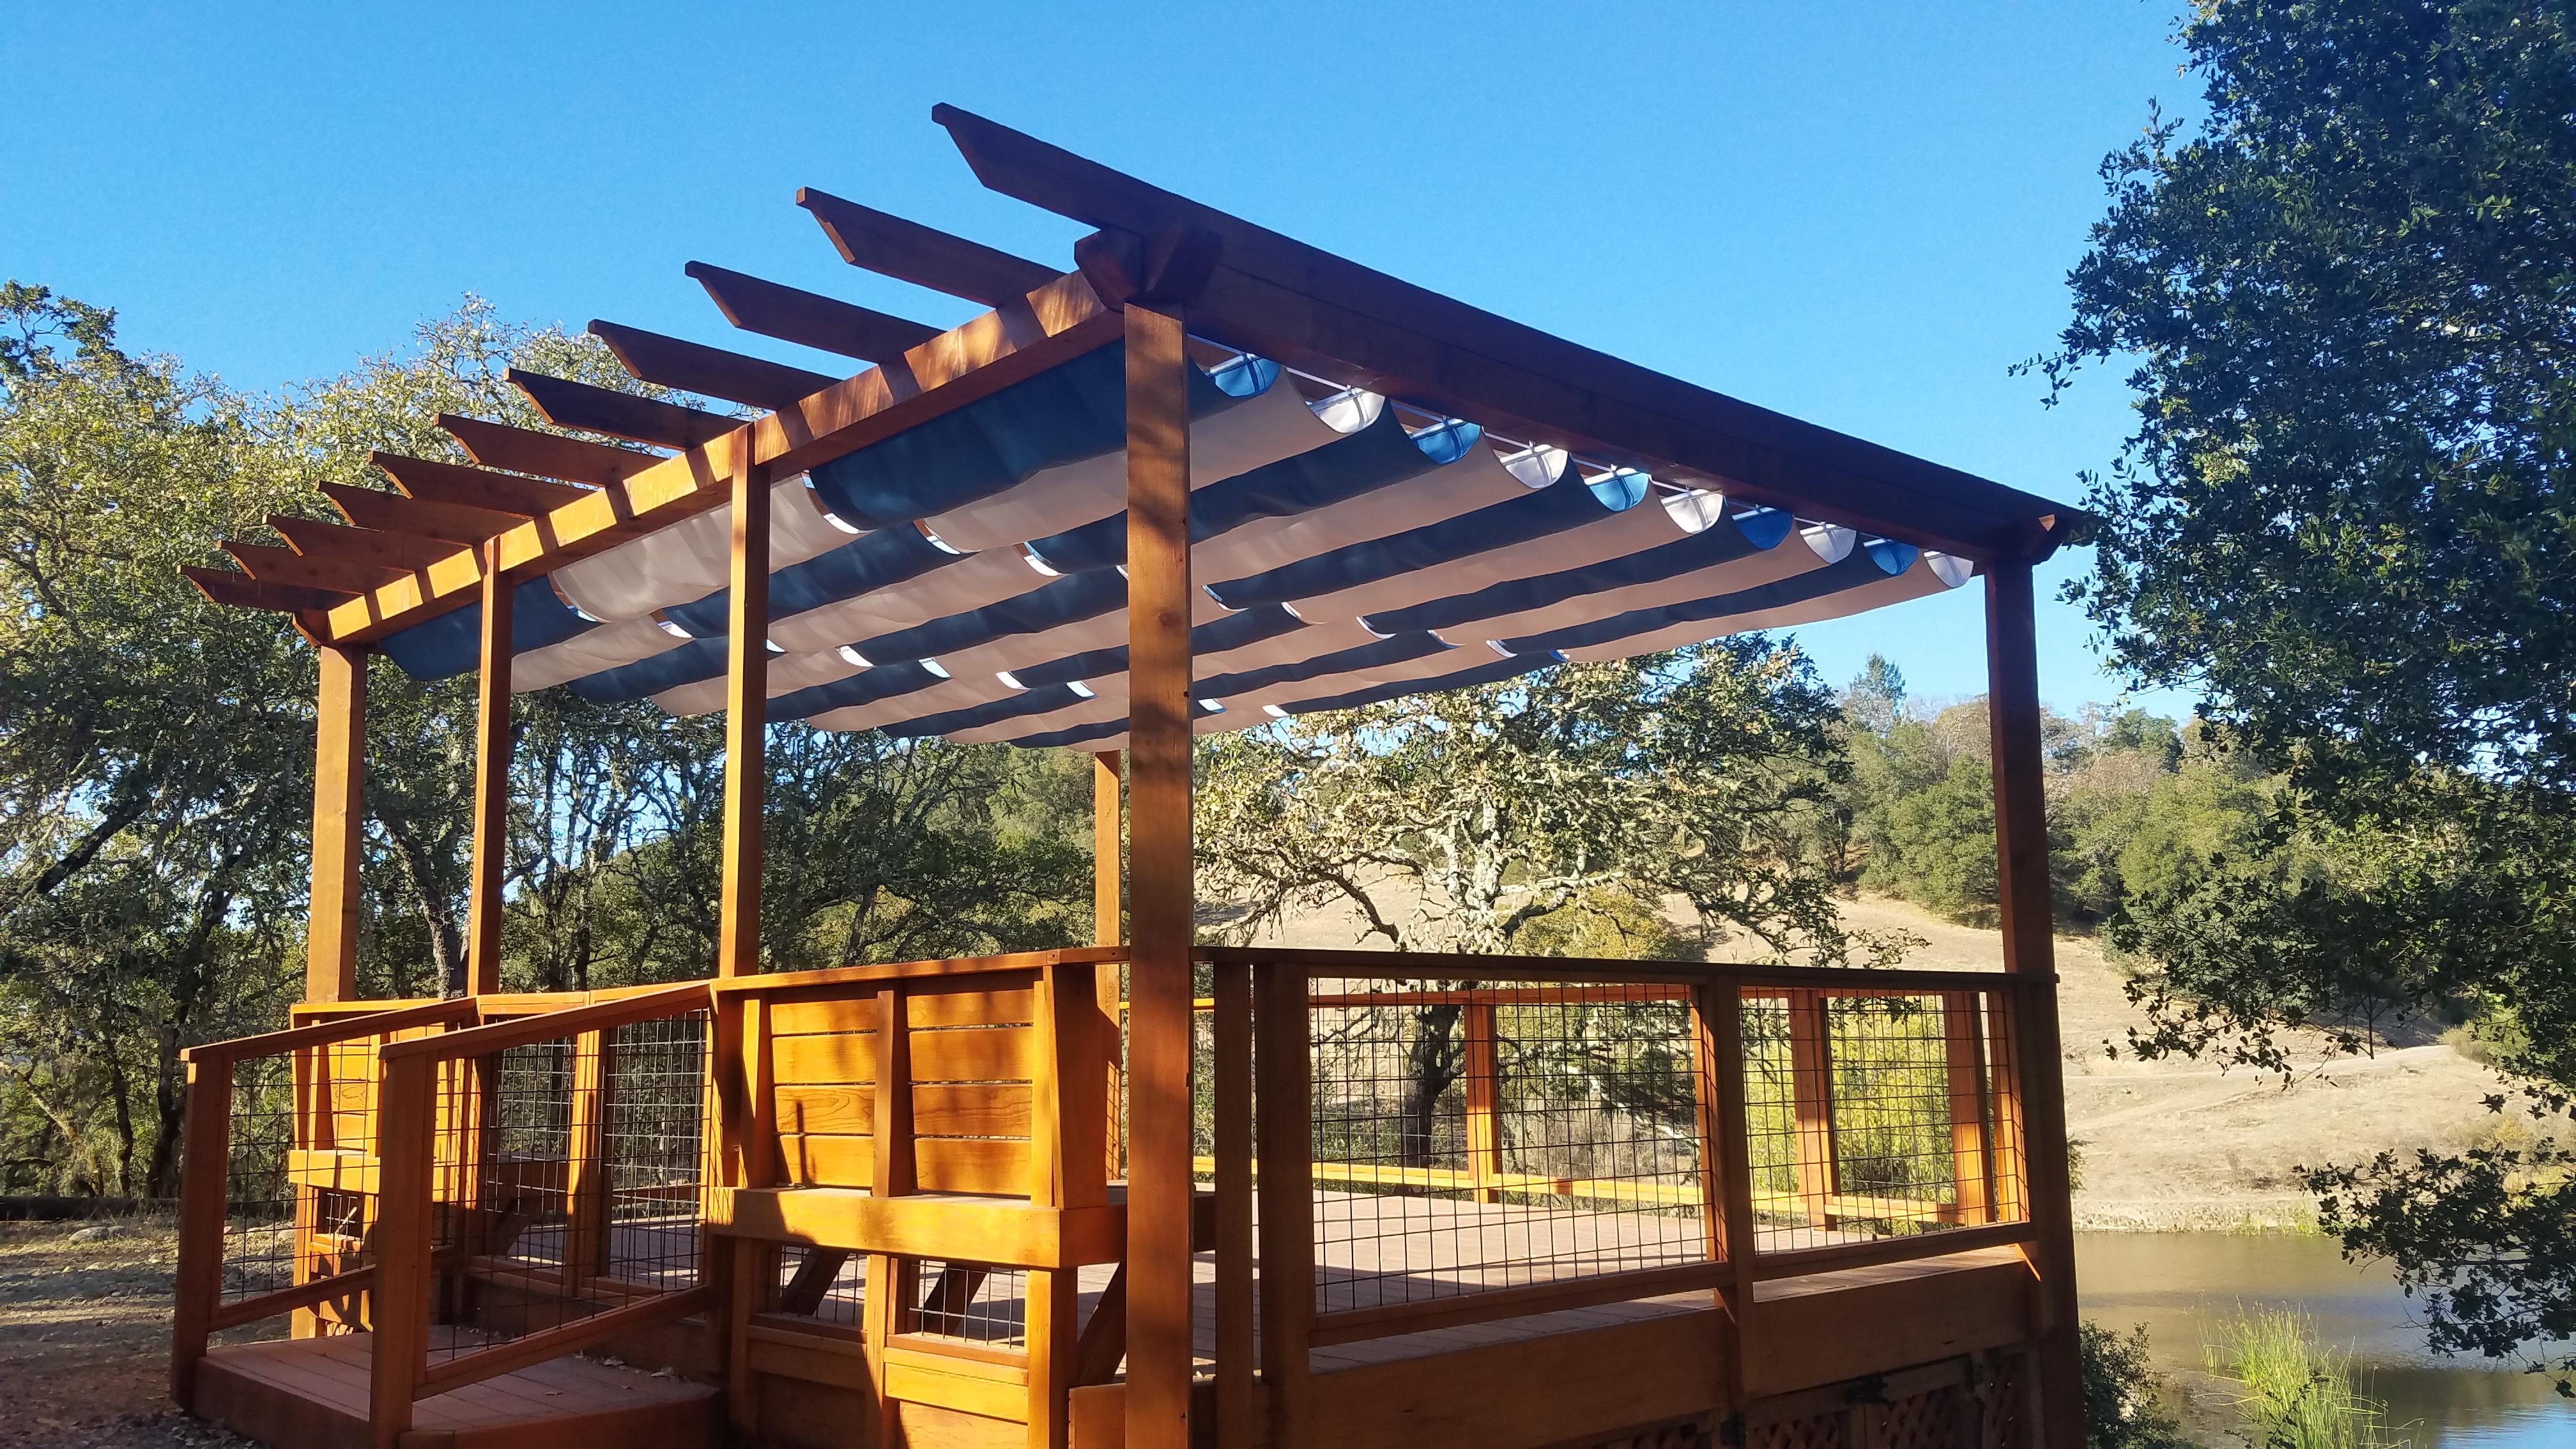 Infinity canopy over a gazebo